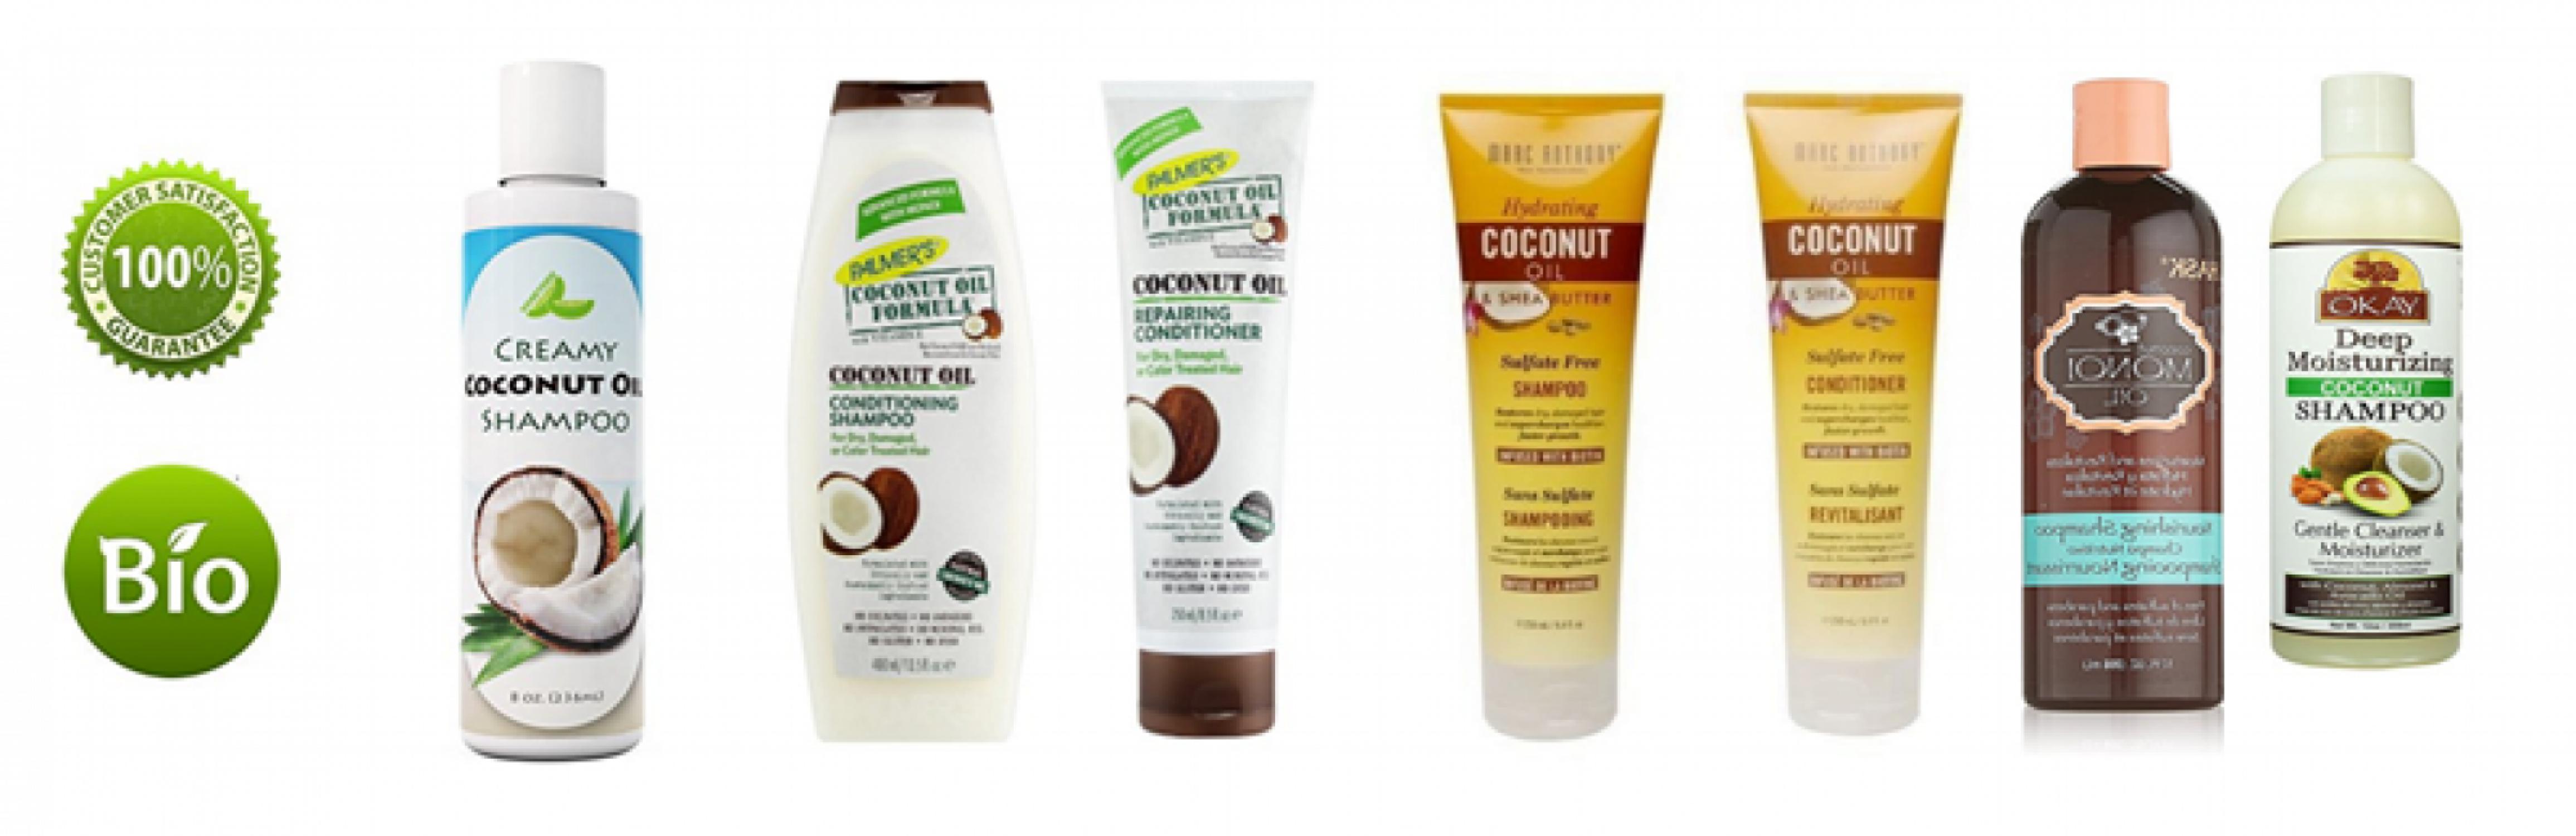 Best Coconut Oil Shampoos   Best 7 Coconut Oil Shampoos